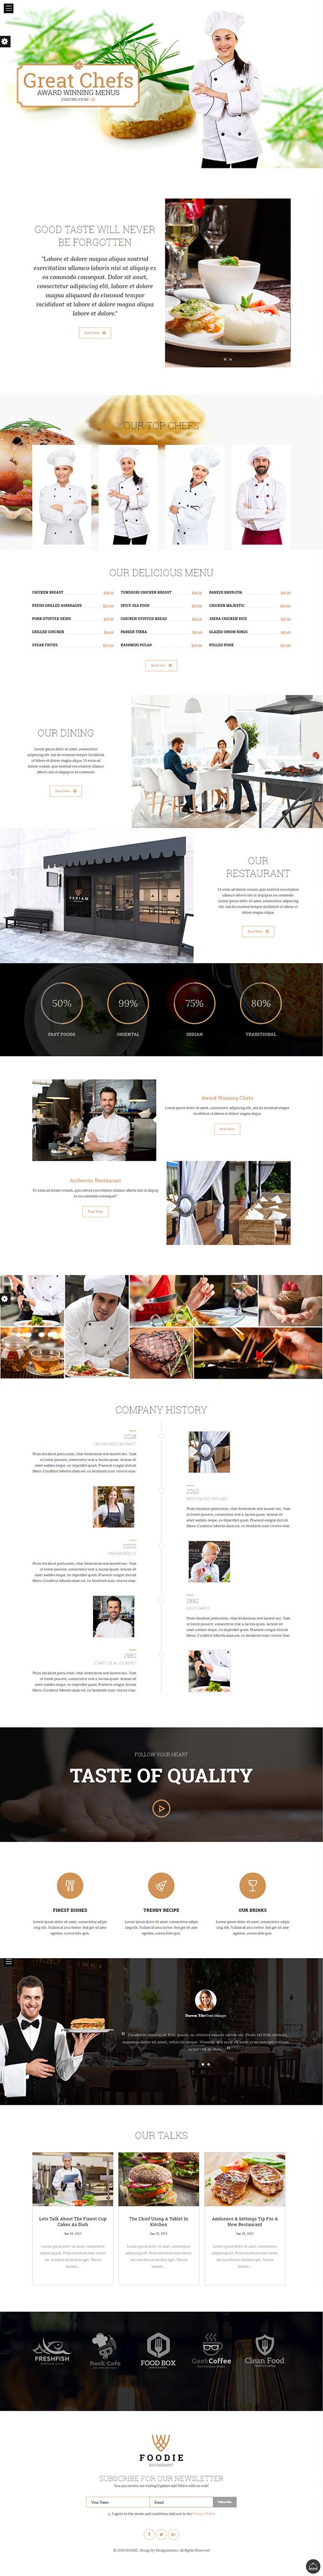 Foodie - Restaurant WP theme